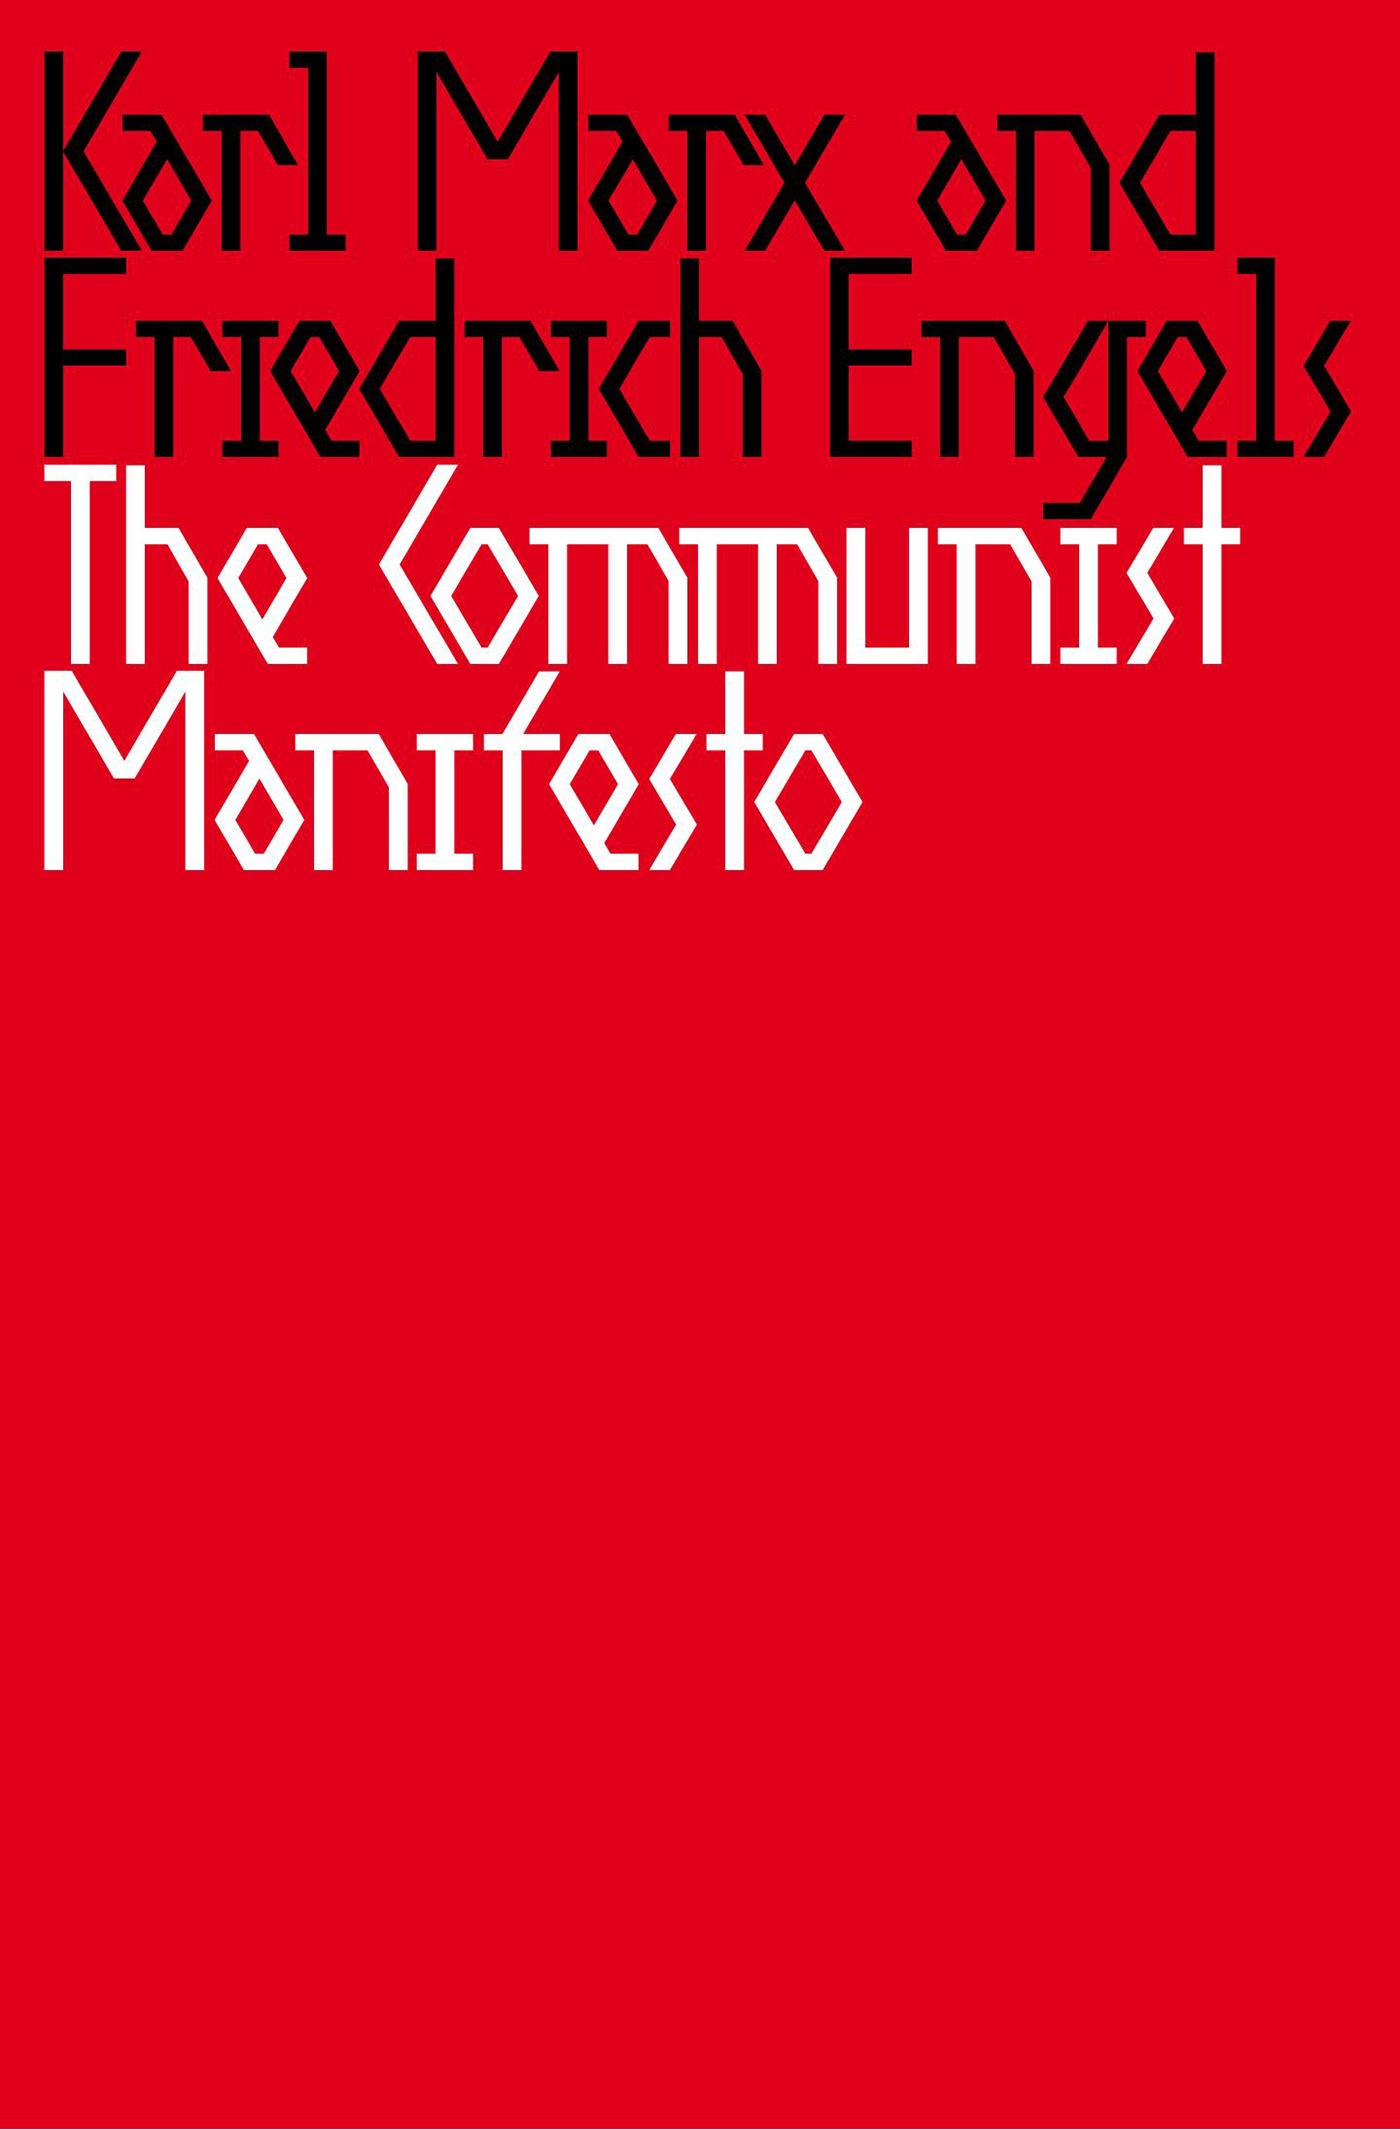 communist party essay